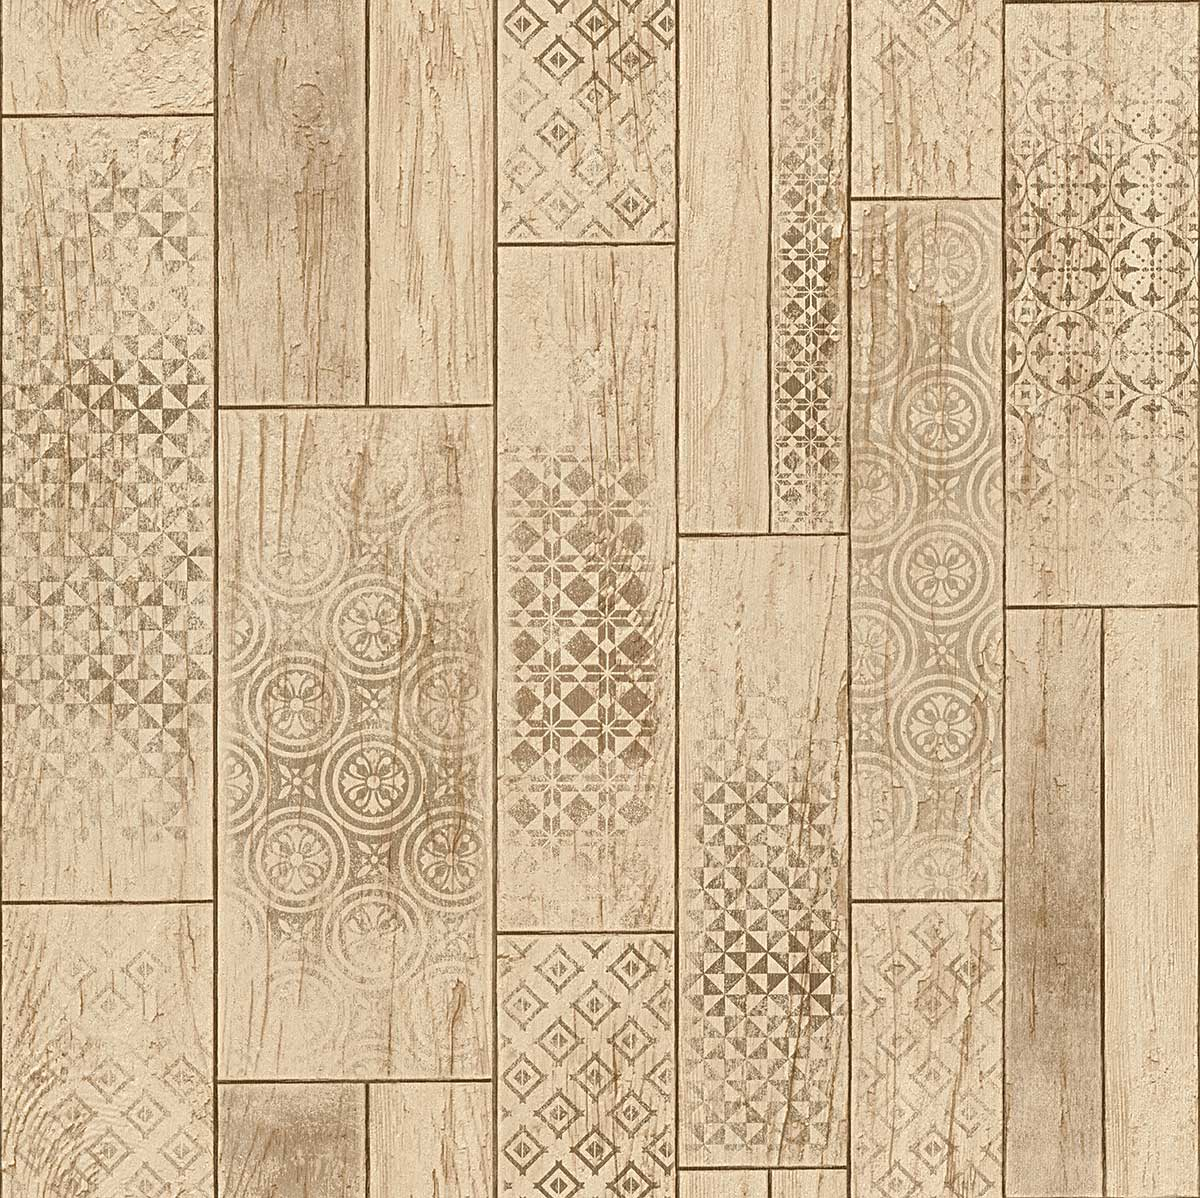 papier peint imitation lambris motifs azuleros marron. Black Bedroom Furniture Sets. Home Design Ideas